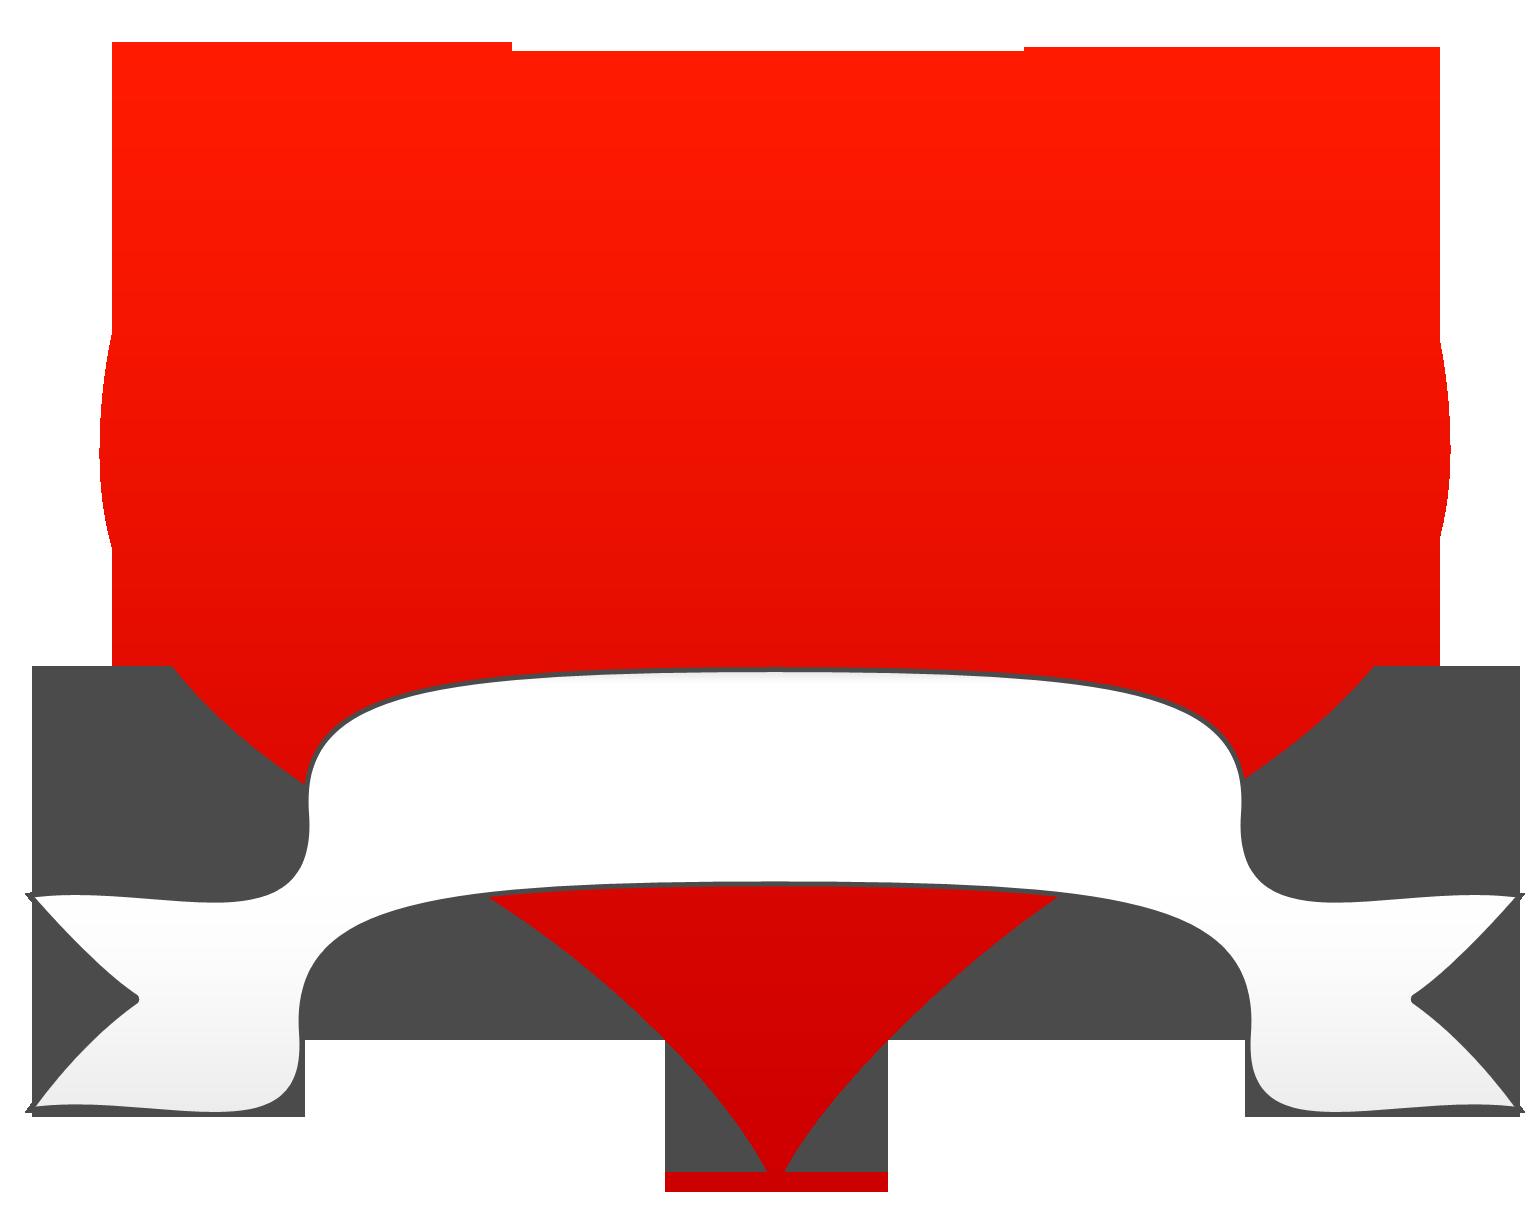 Hearts heart clip art images 3